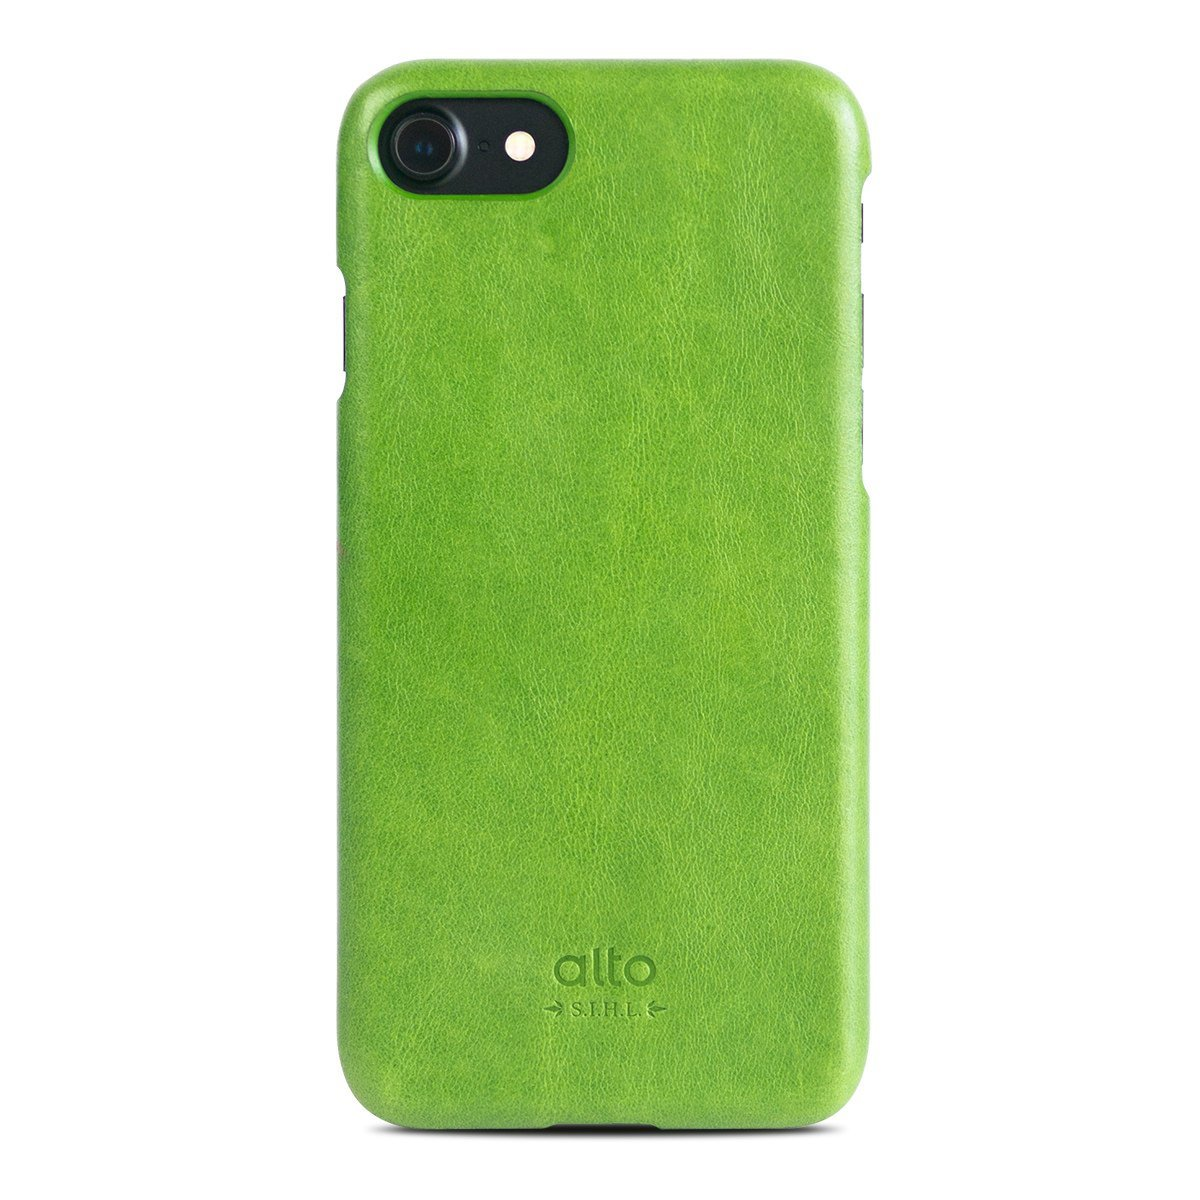 iPhone 8 / 7 皮革保護殼 Original – 萊姆綠